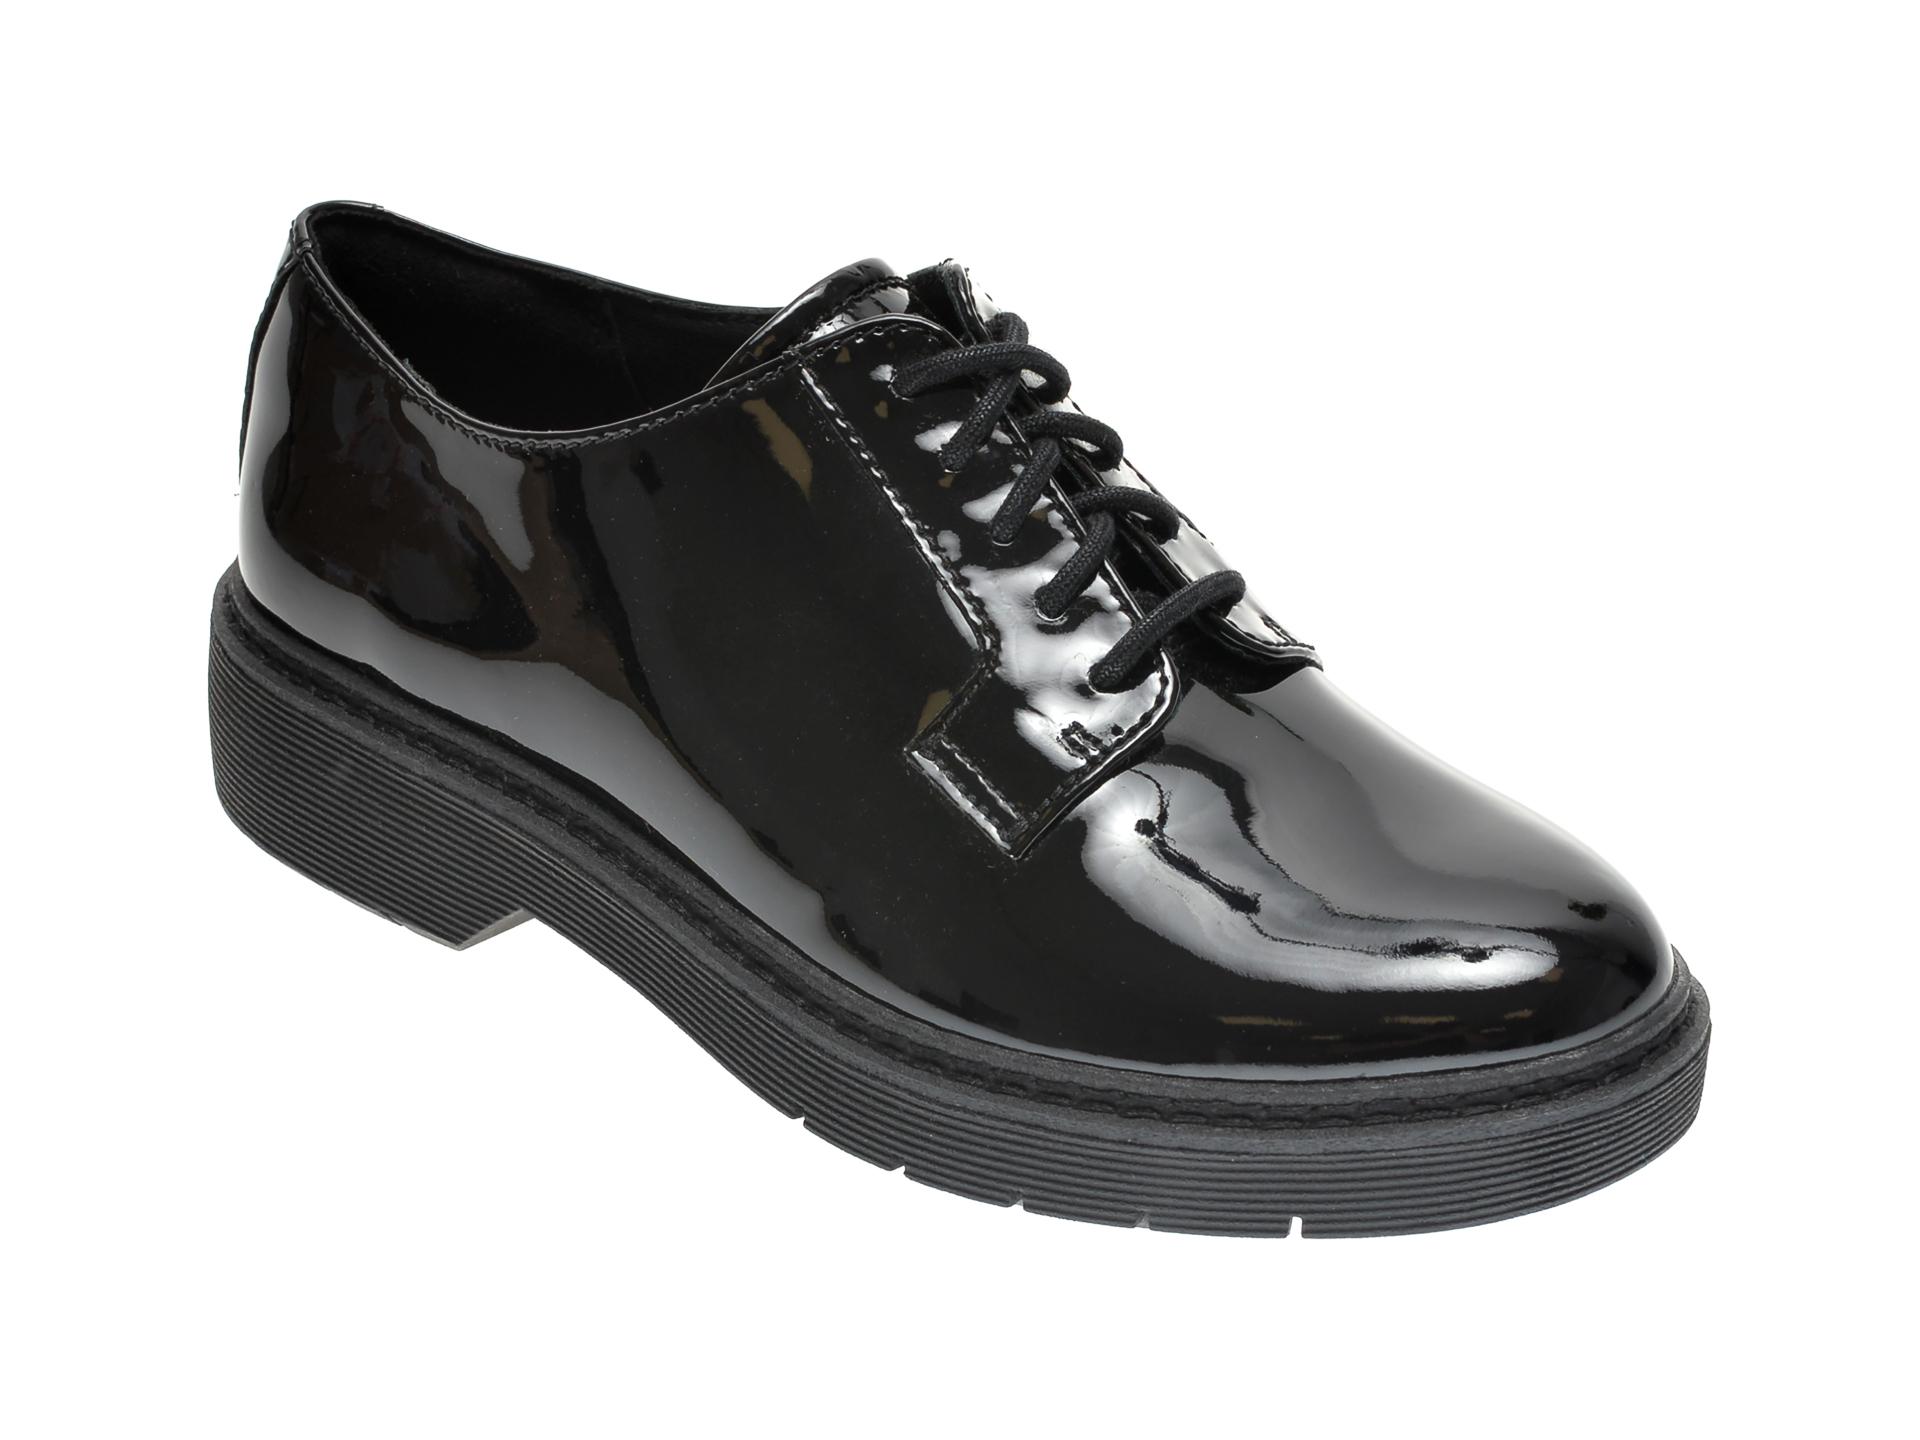 Pantofi CLARKS negri, WITCOMBE LACE, din piele naturala lacuita imagine